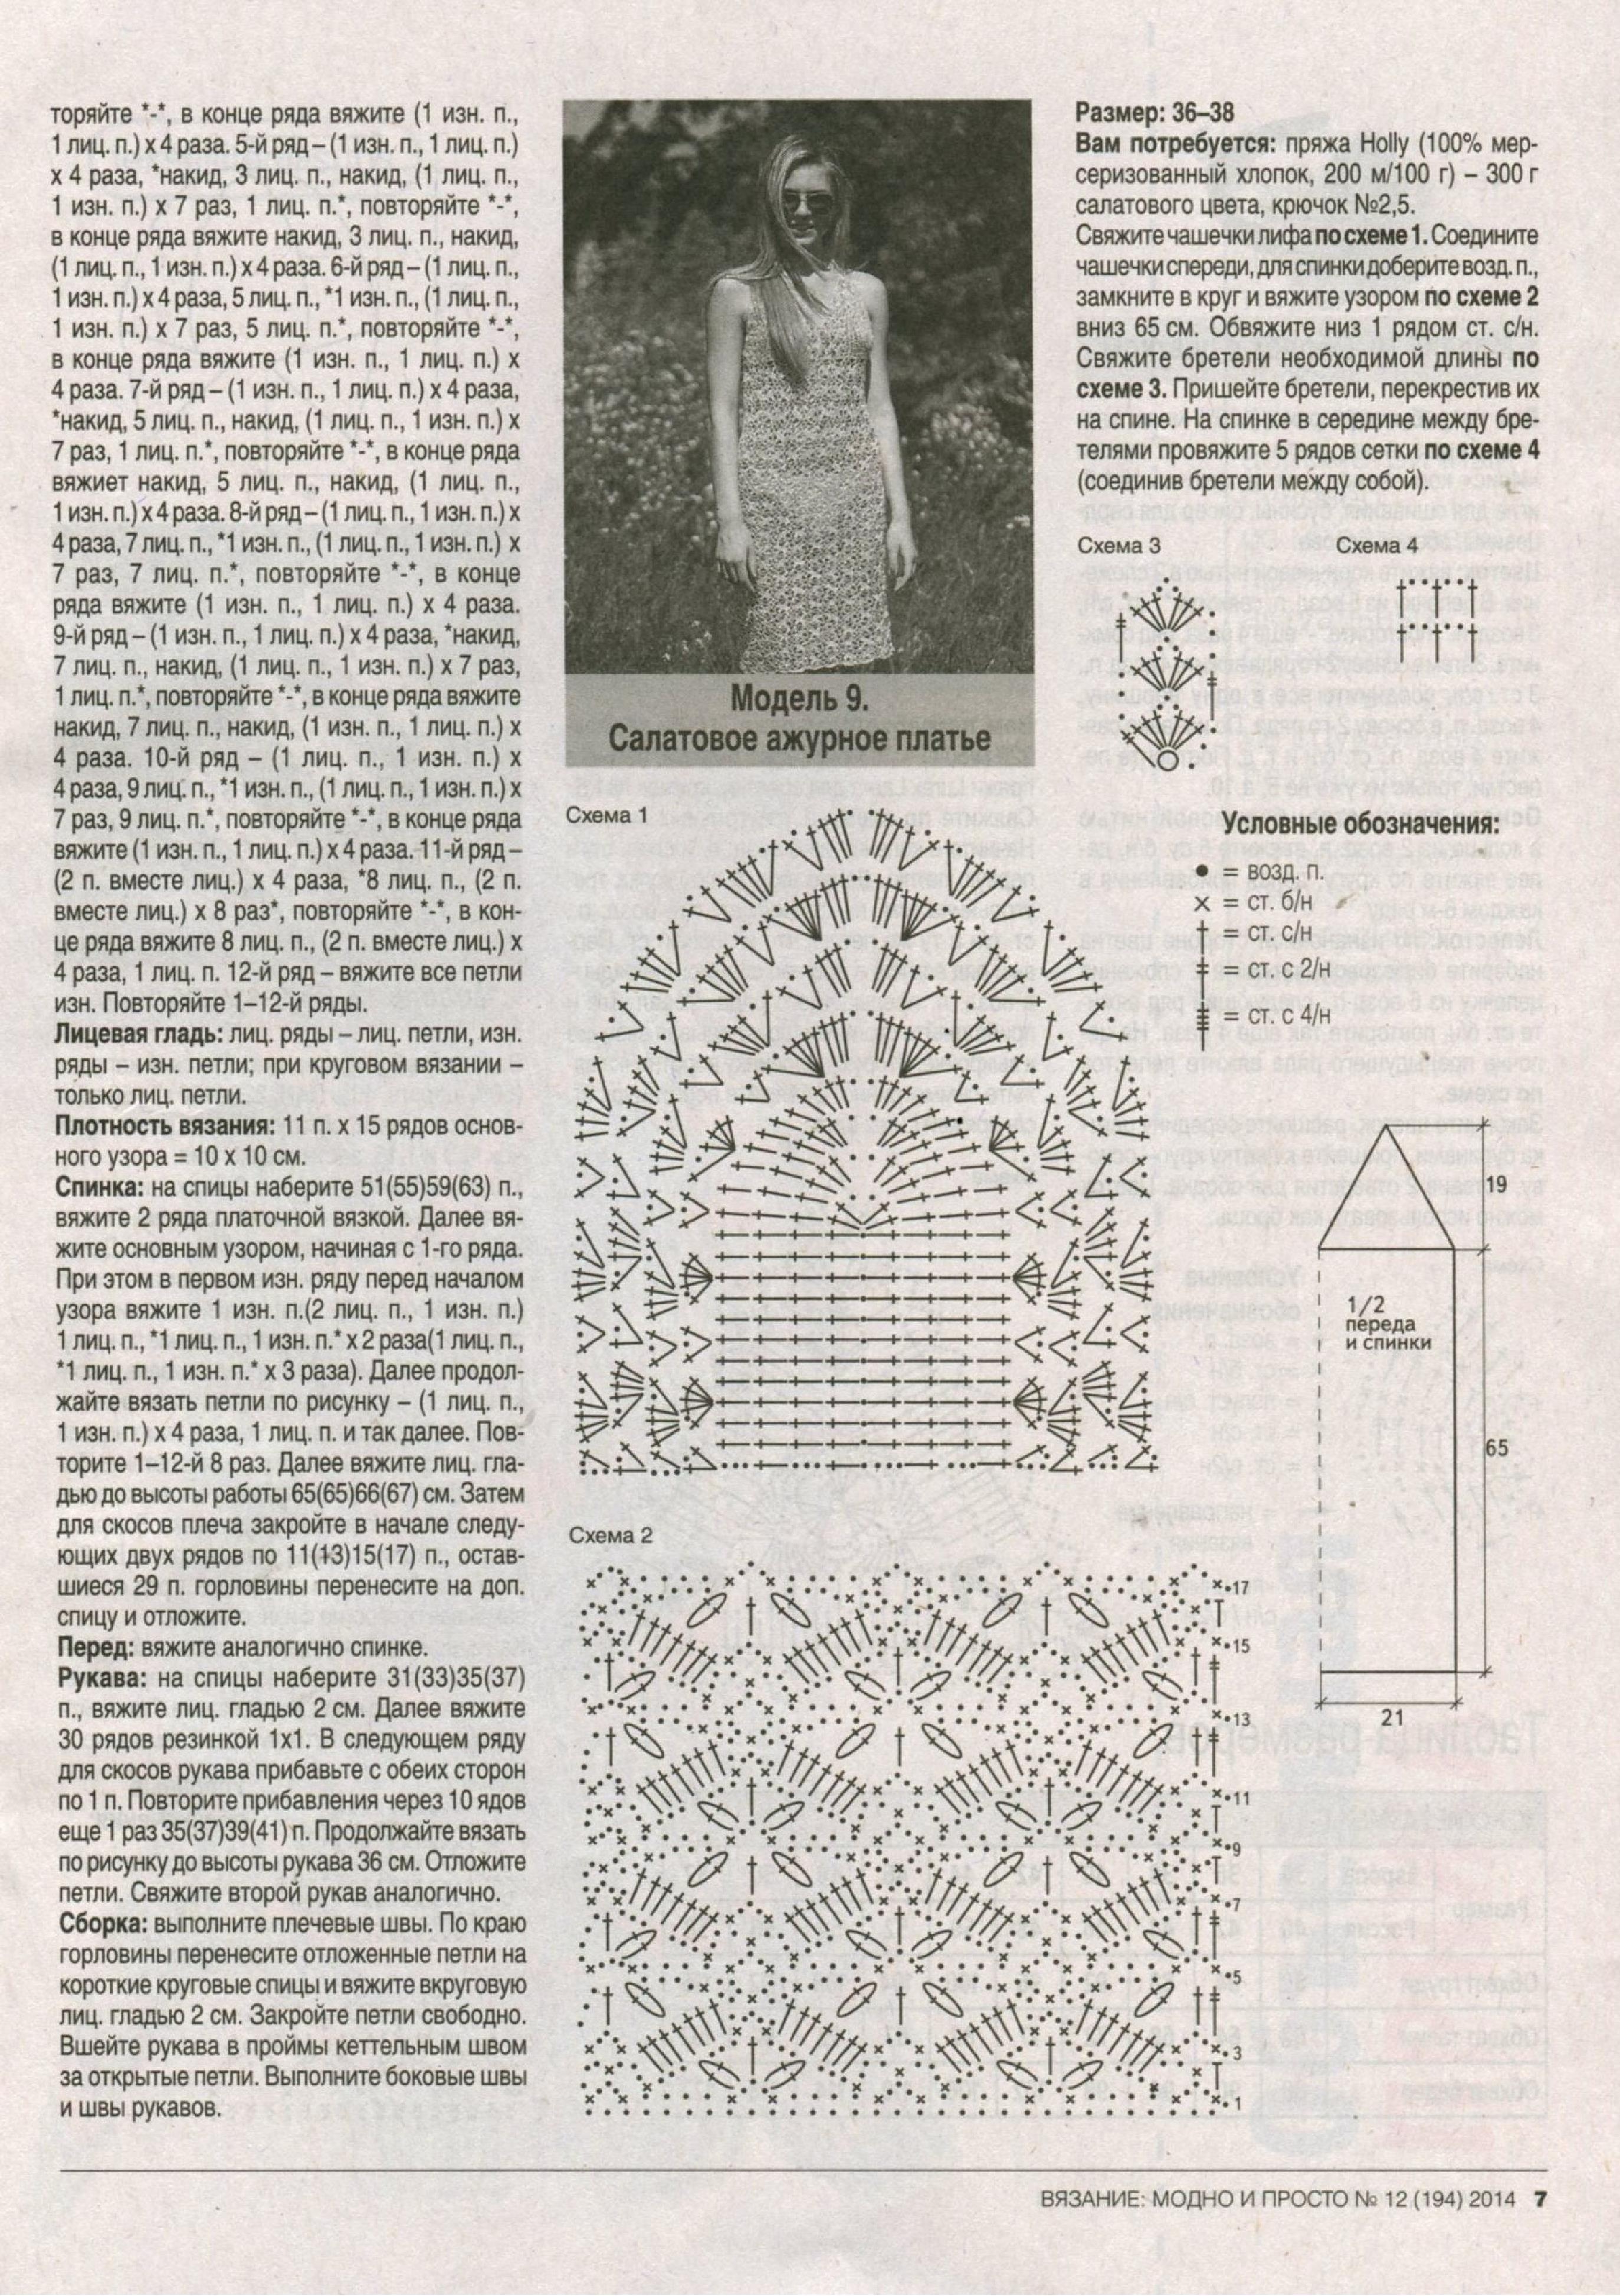 Imgbox Fast Simple Image Host Crochet Doily Diagram Crochet Patterns Crochet Magazine